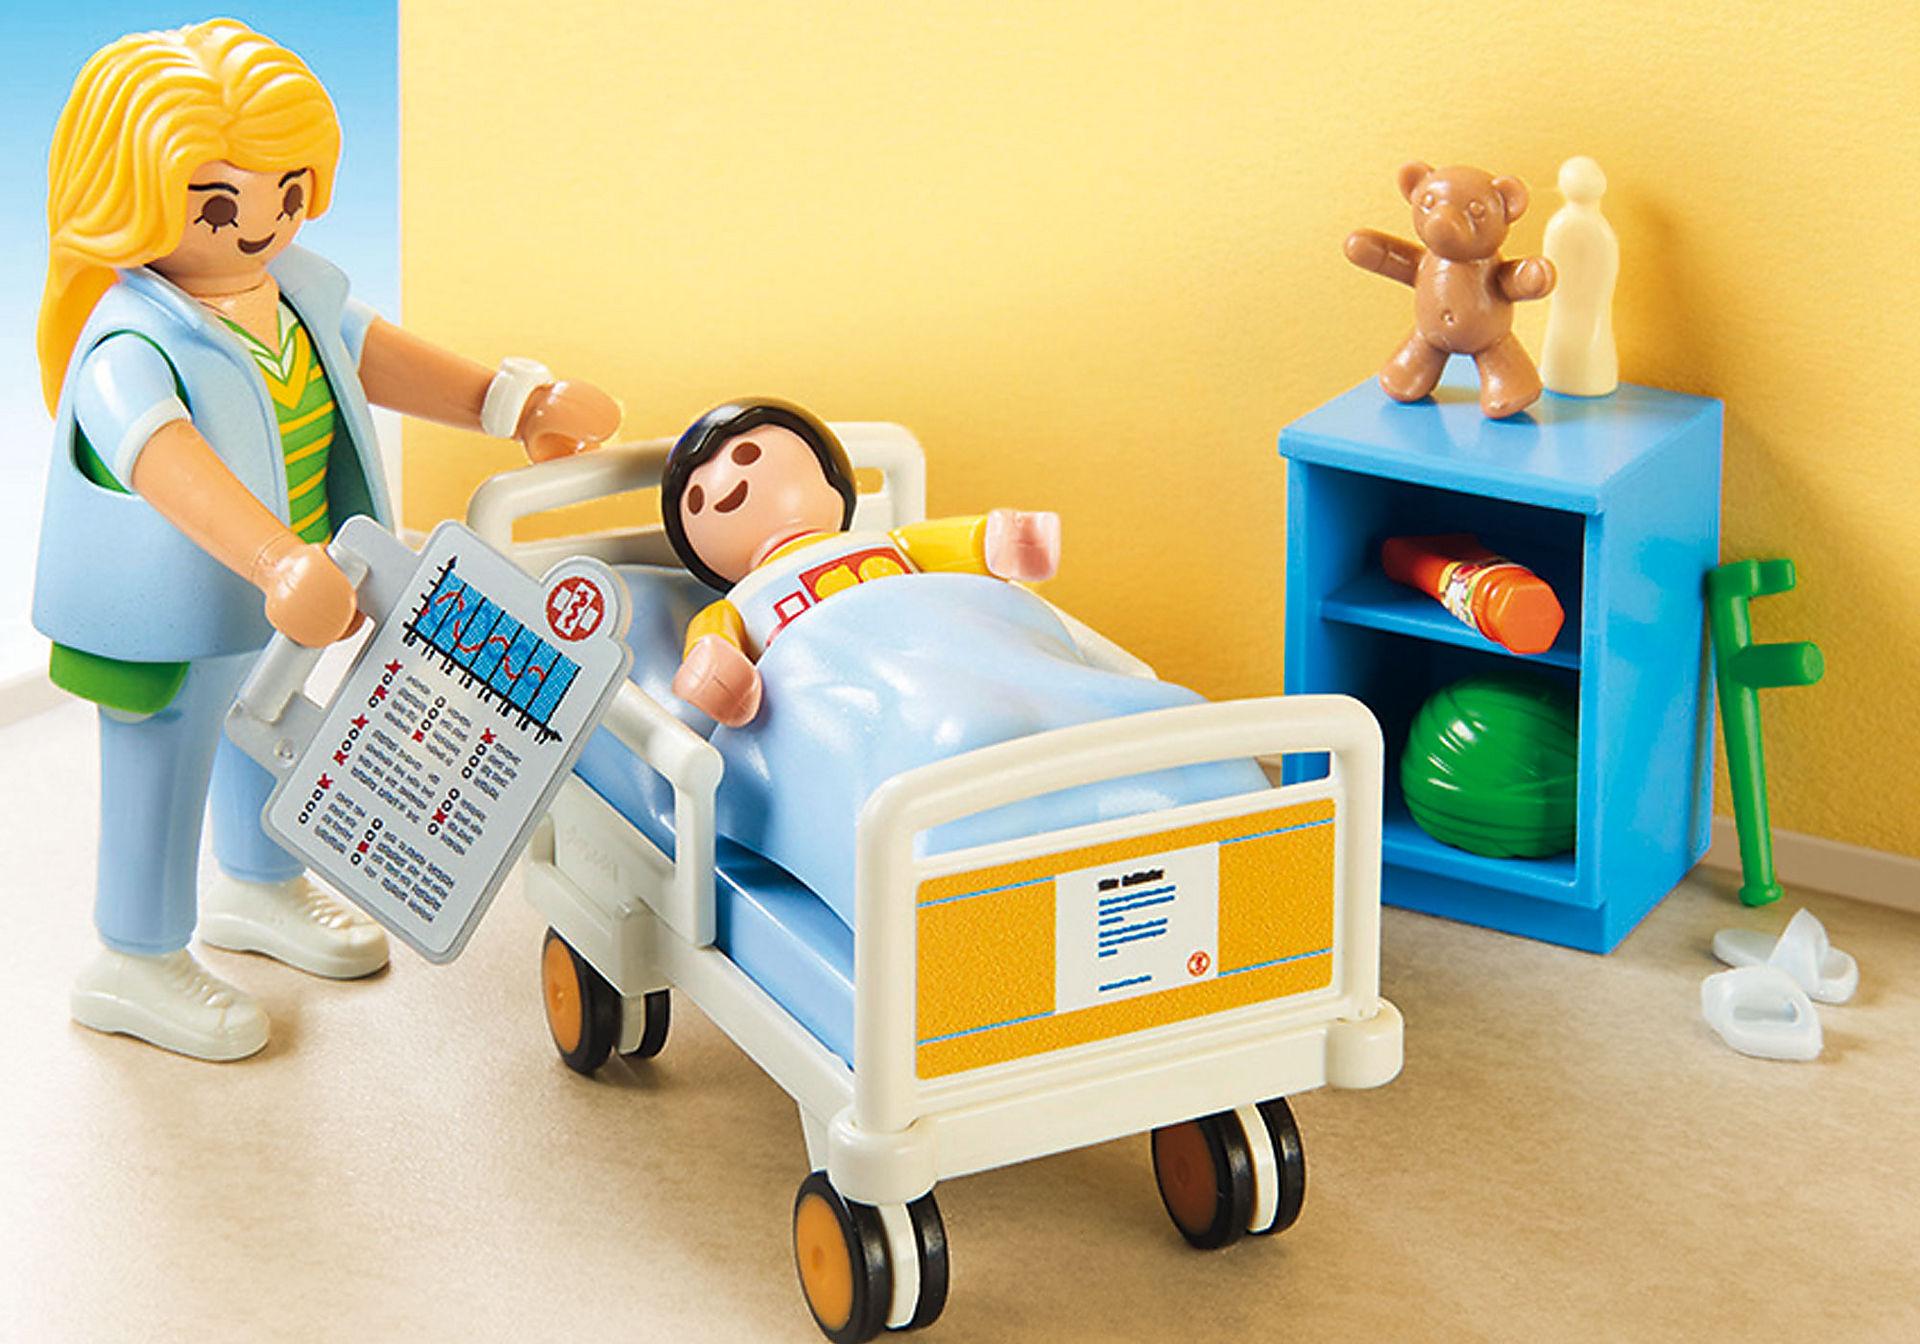 70192 Children's Hospital Room zoom image5